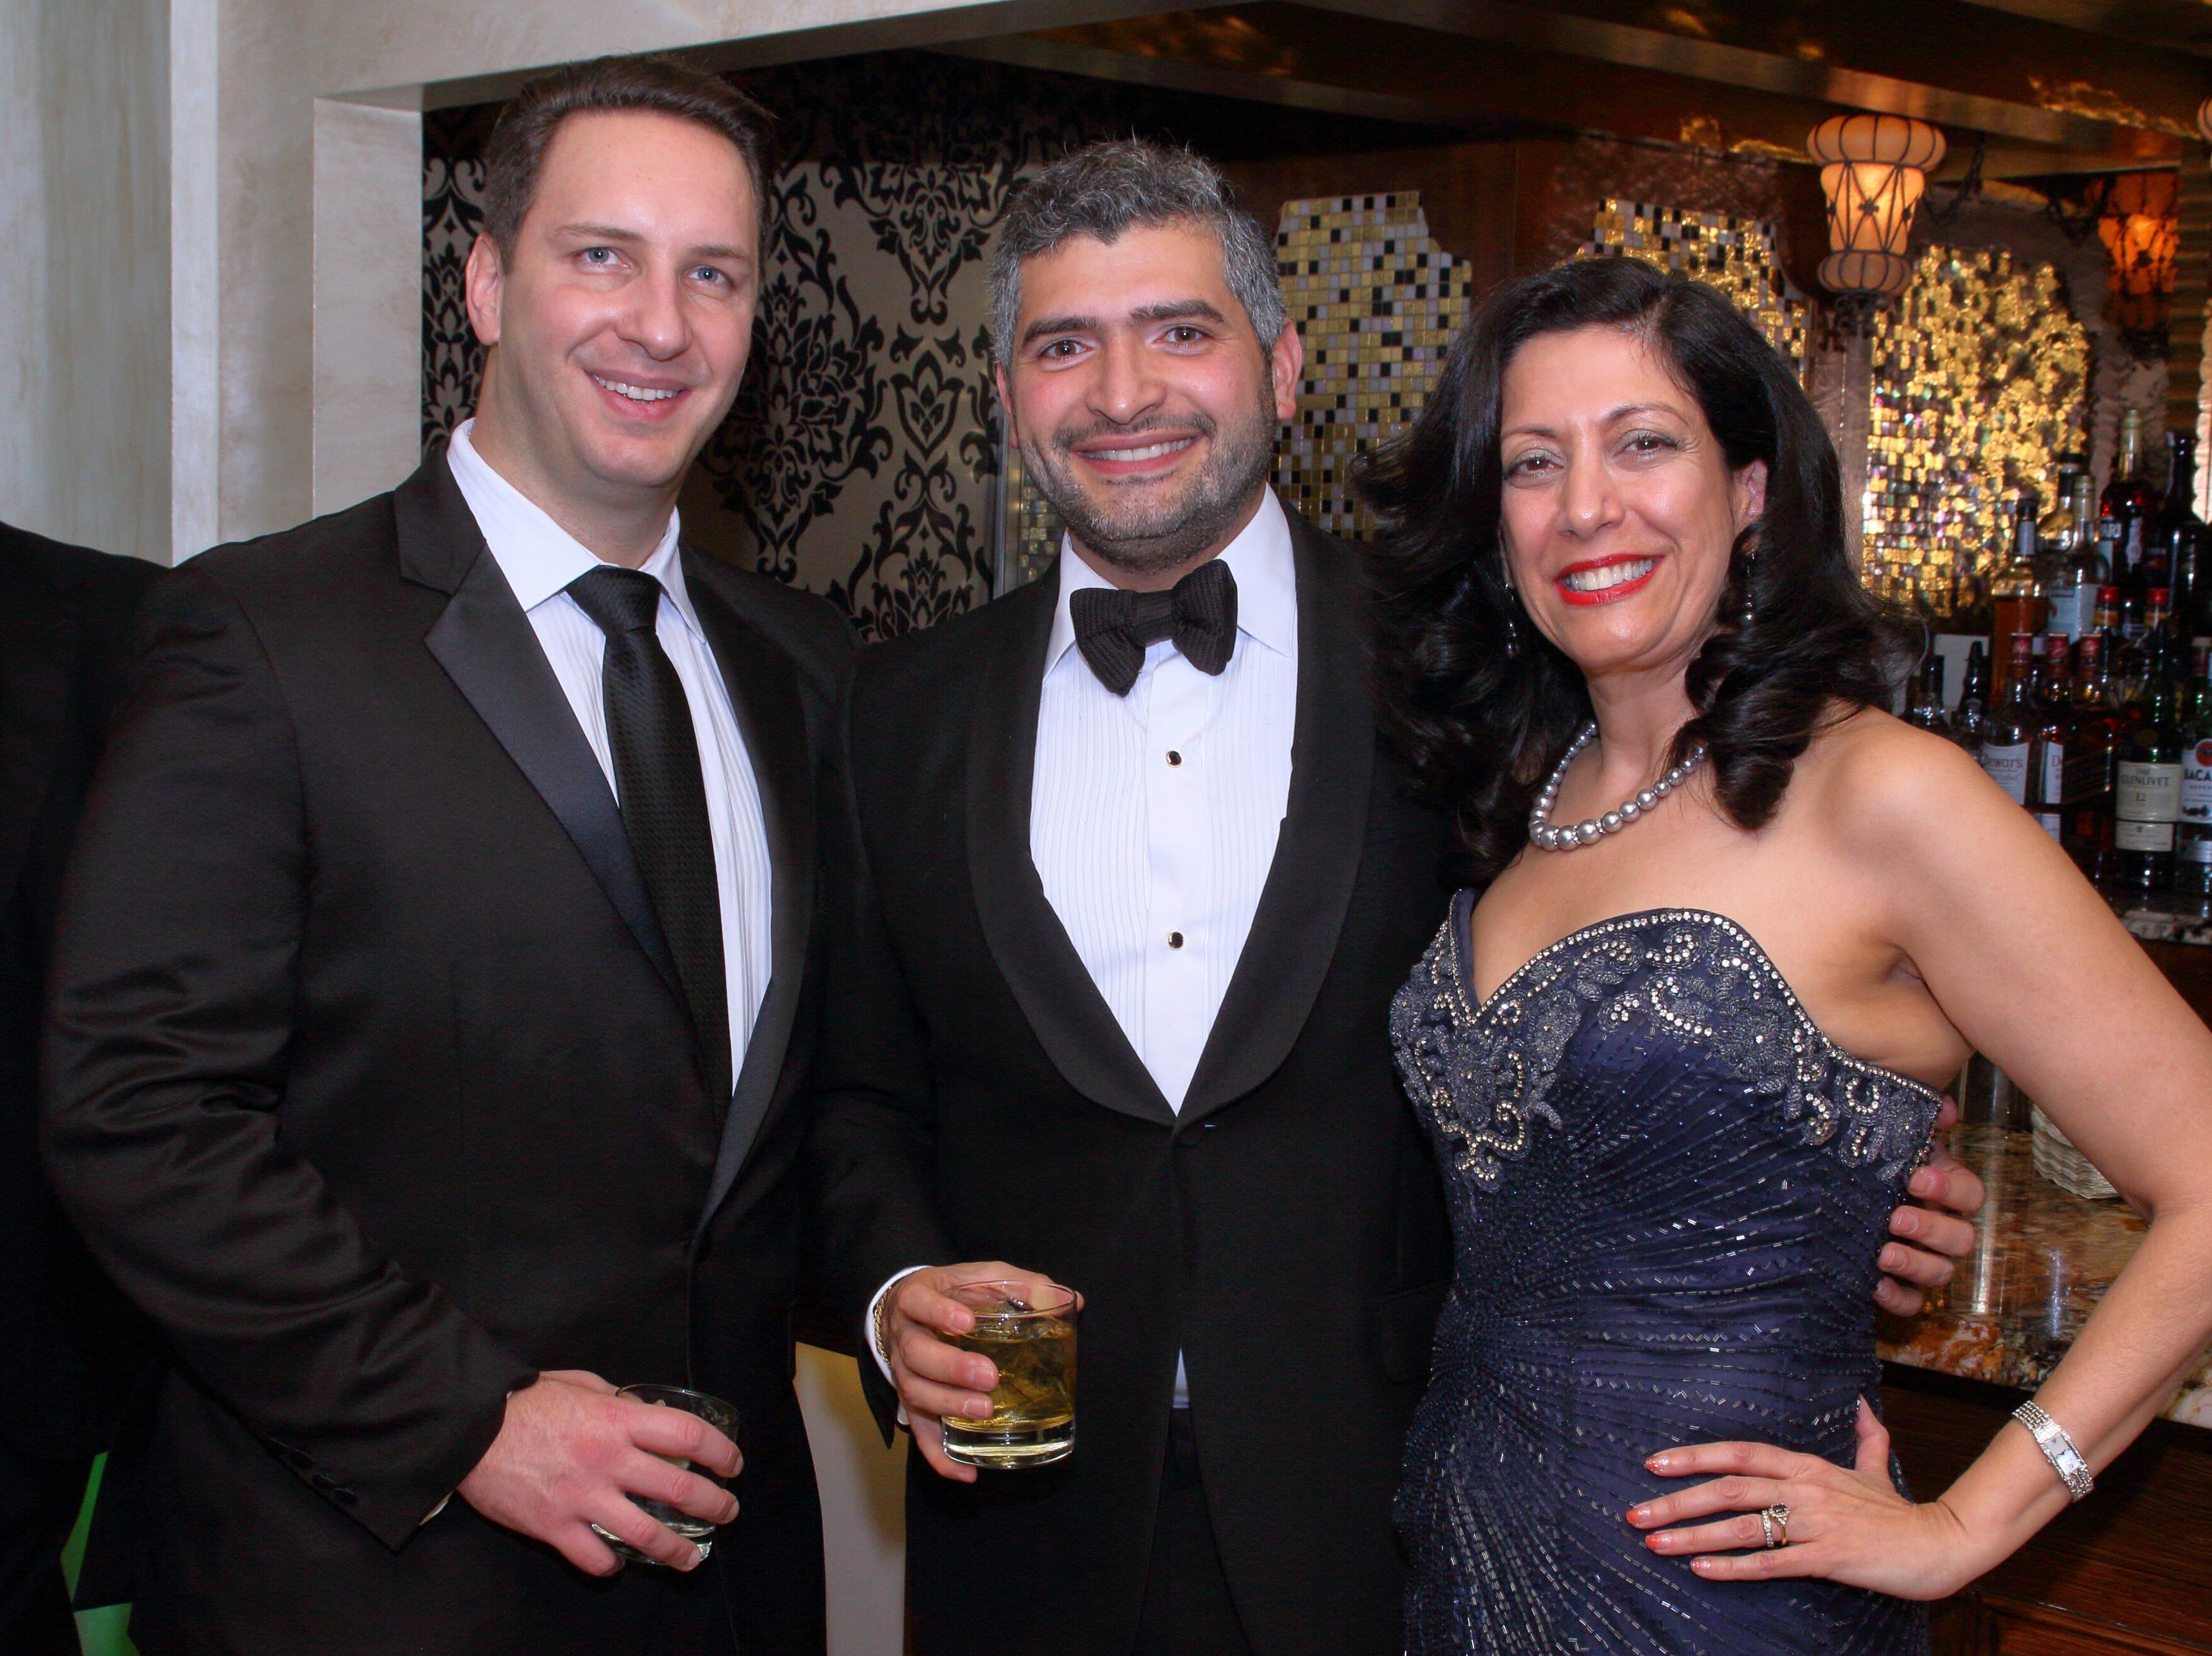 Nick Ponzini, Nima Ameri, Helena Lobo-Zagorski. The Saddle River Valley Club held its annual Holiday Gala celebration at Seasons in Washington Township. 11/30/2018